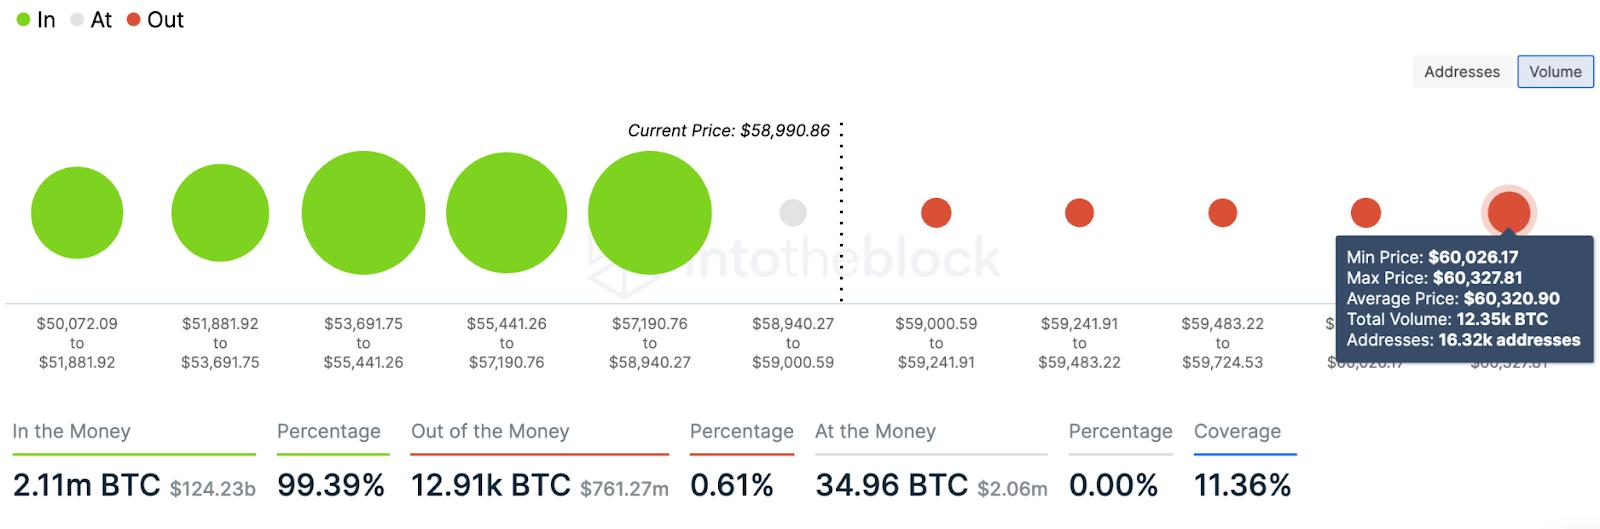 btc/usd volume chart 040221